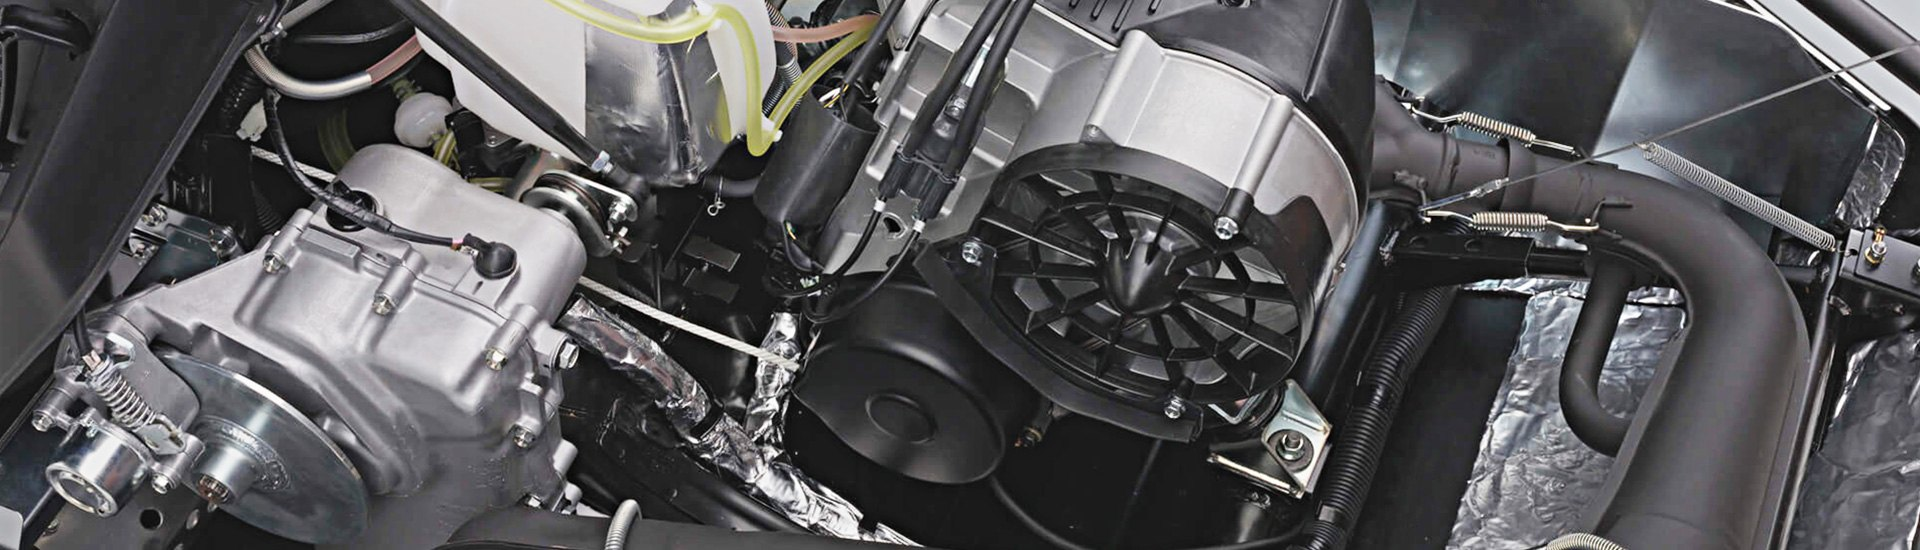 Kawasaki Snowmobile Engine Parts   Belts, Pistons, Rings, Gaskets